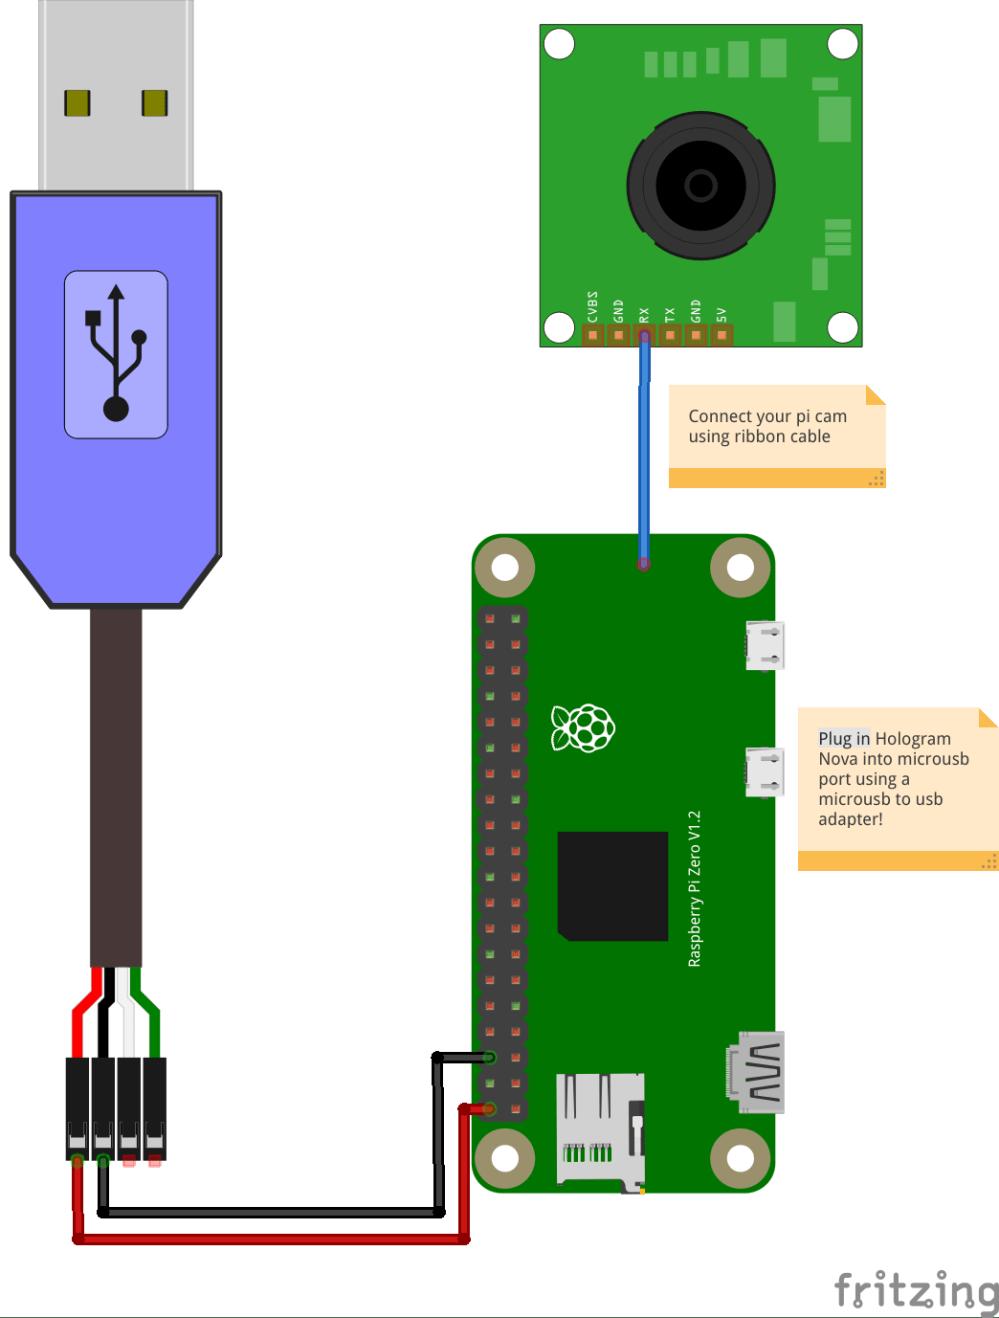 medium resolution of hackster imgix net uploads attachments 407096 robo ar drone 2 0 wiring diagram